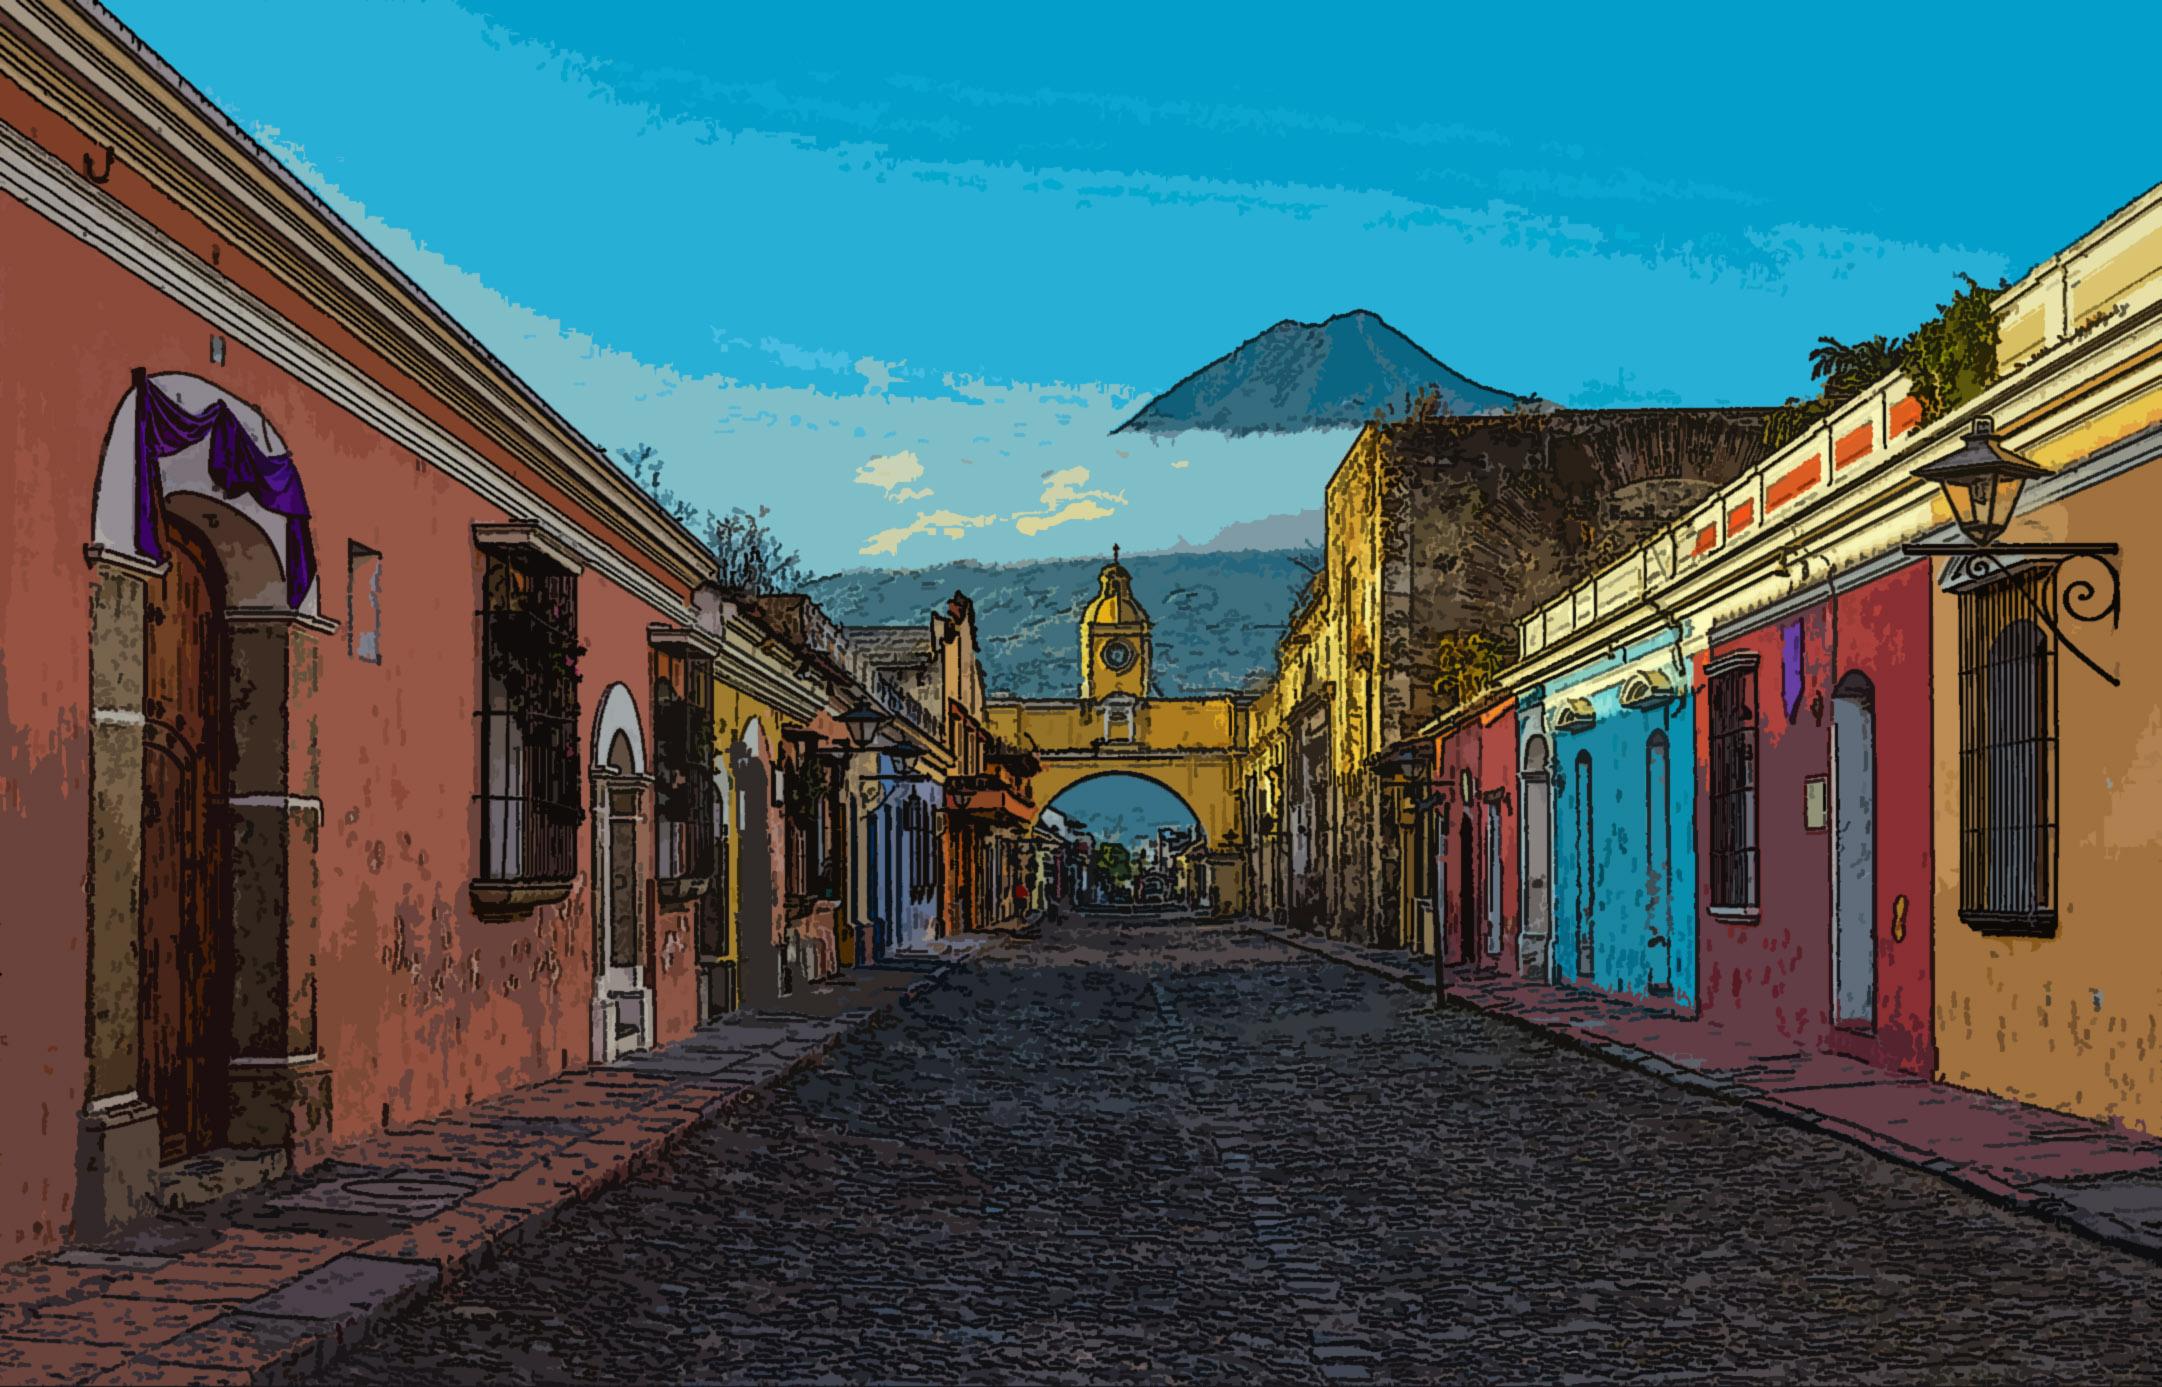 Antigua City at Sunrise